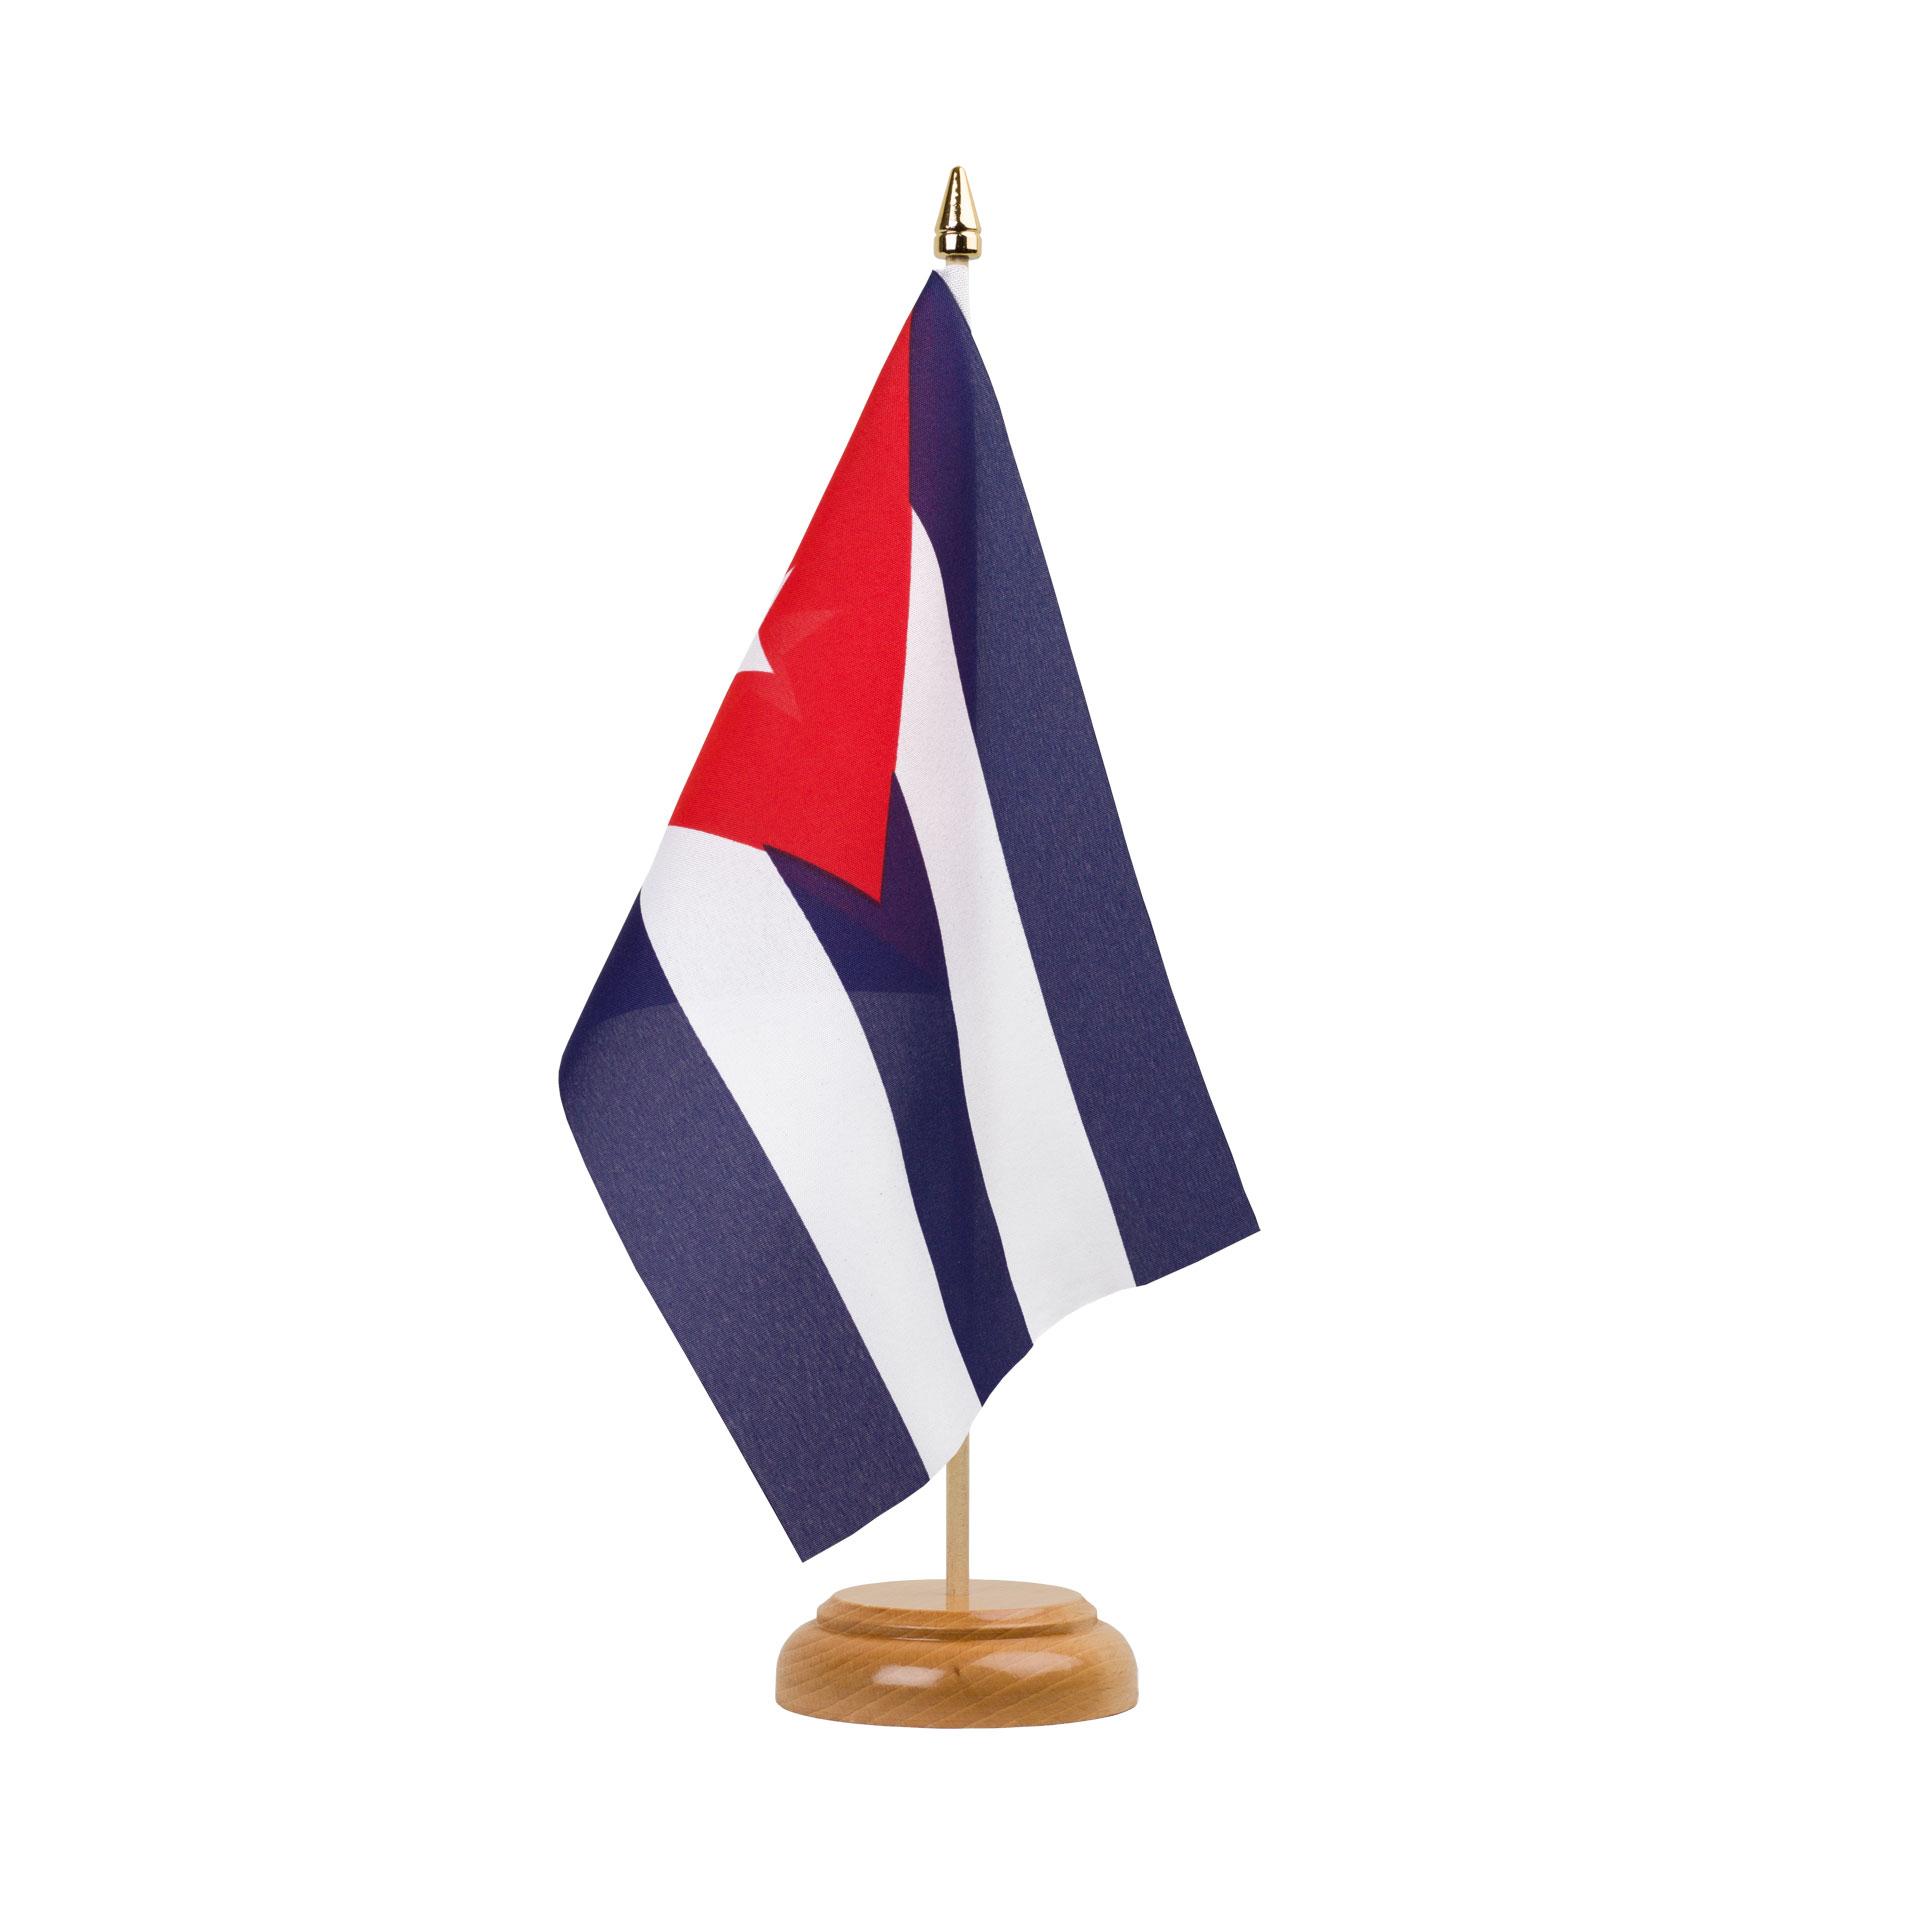 Kuba holz tischflagge 15 x 22 cm shop Kuba dekoration